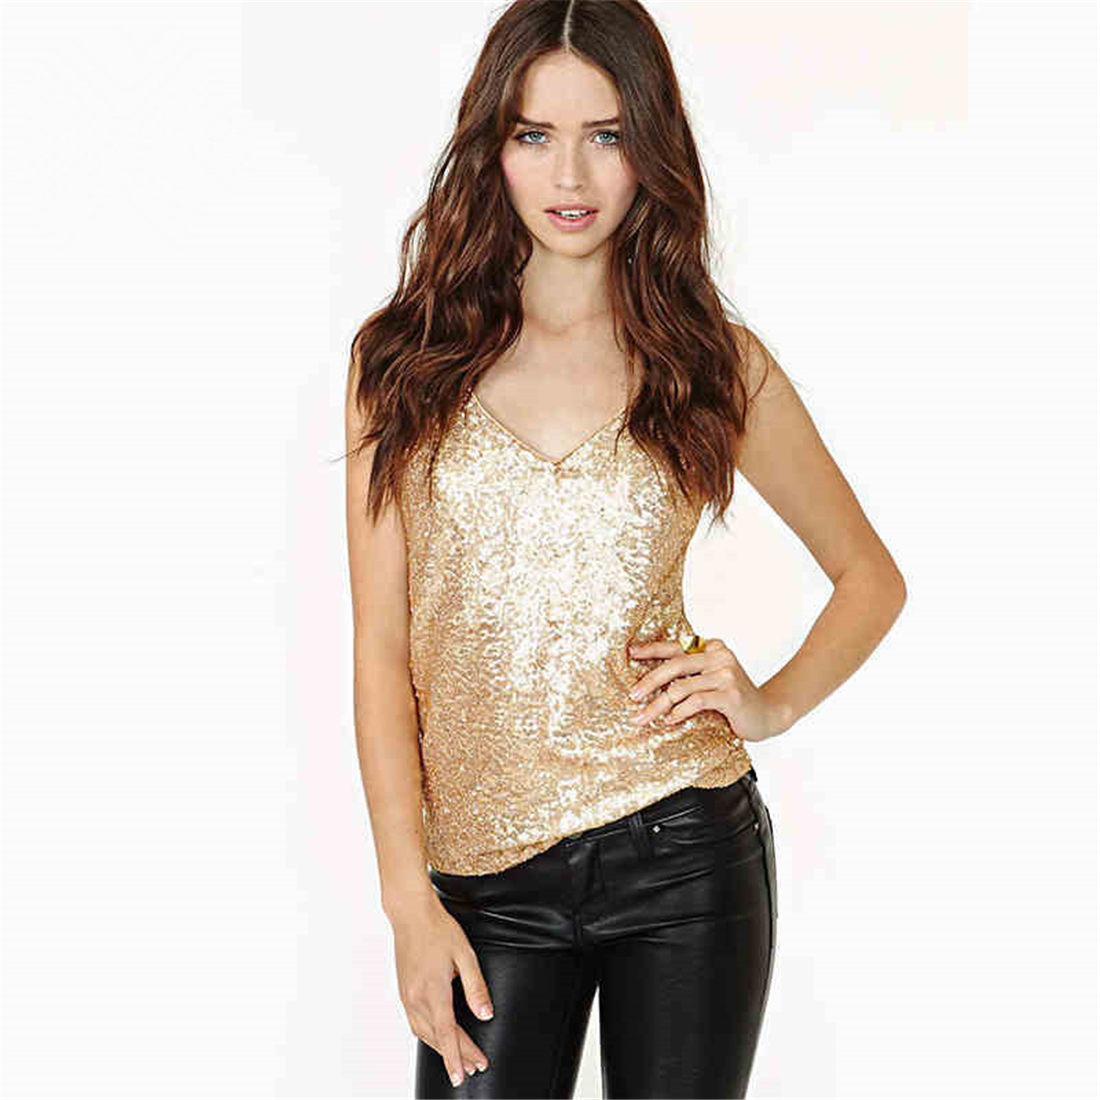 HTB1hZyERVXXXXcwXFXXq6xXFXXXf - Tank Top Summer Sexy Sleeveless Shirts Gold JKP089